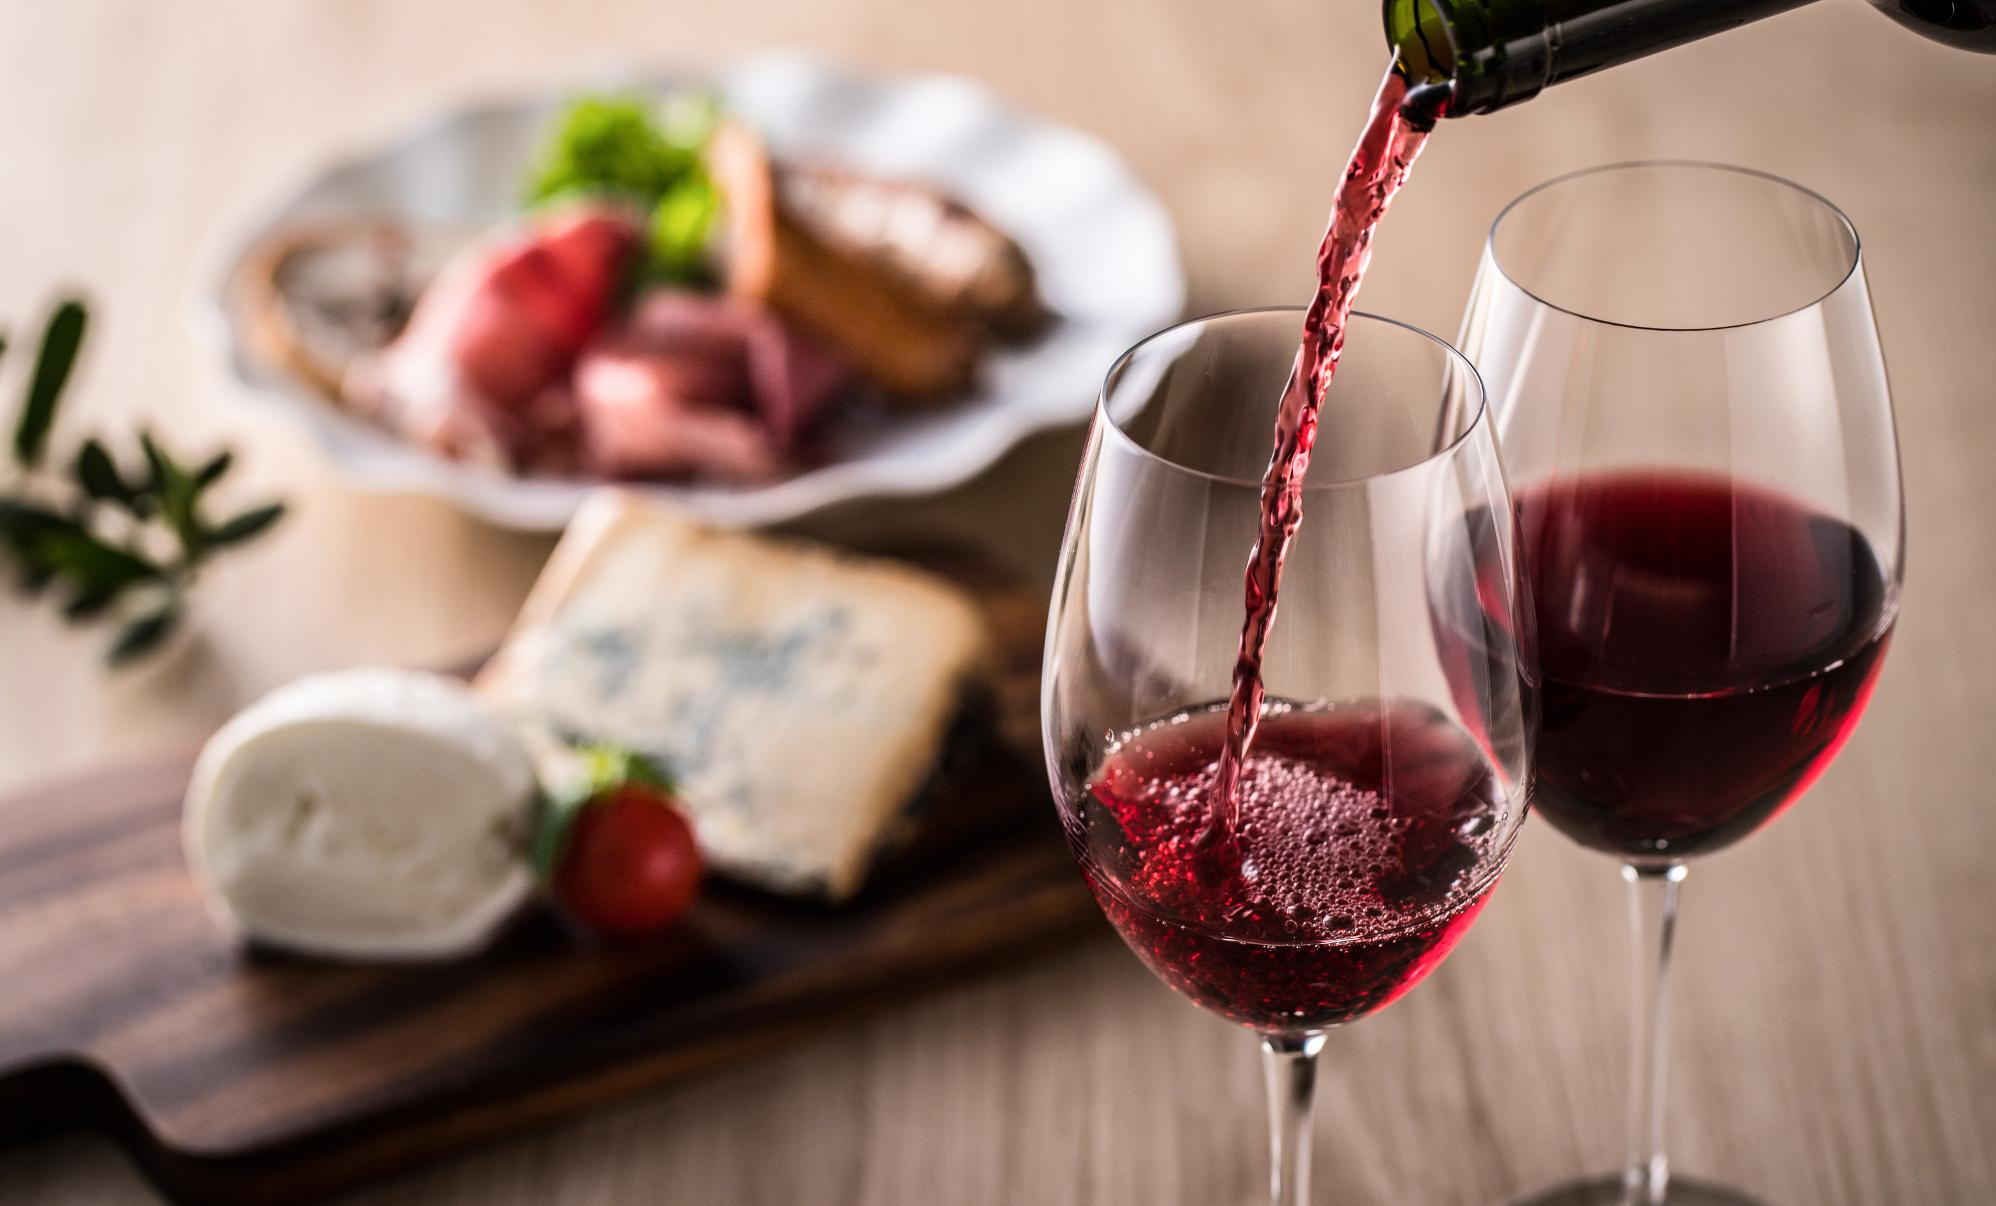 Resultado de imagen para vino tinto